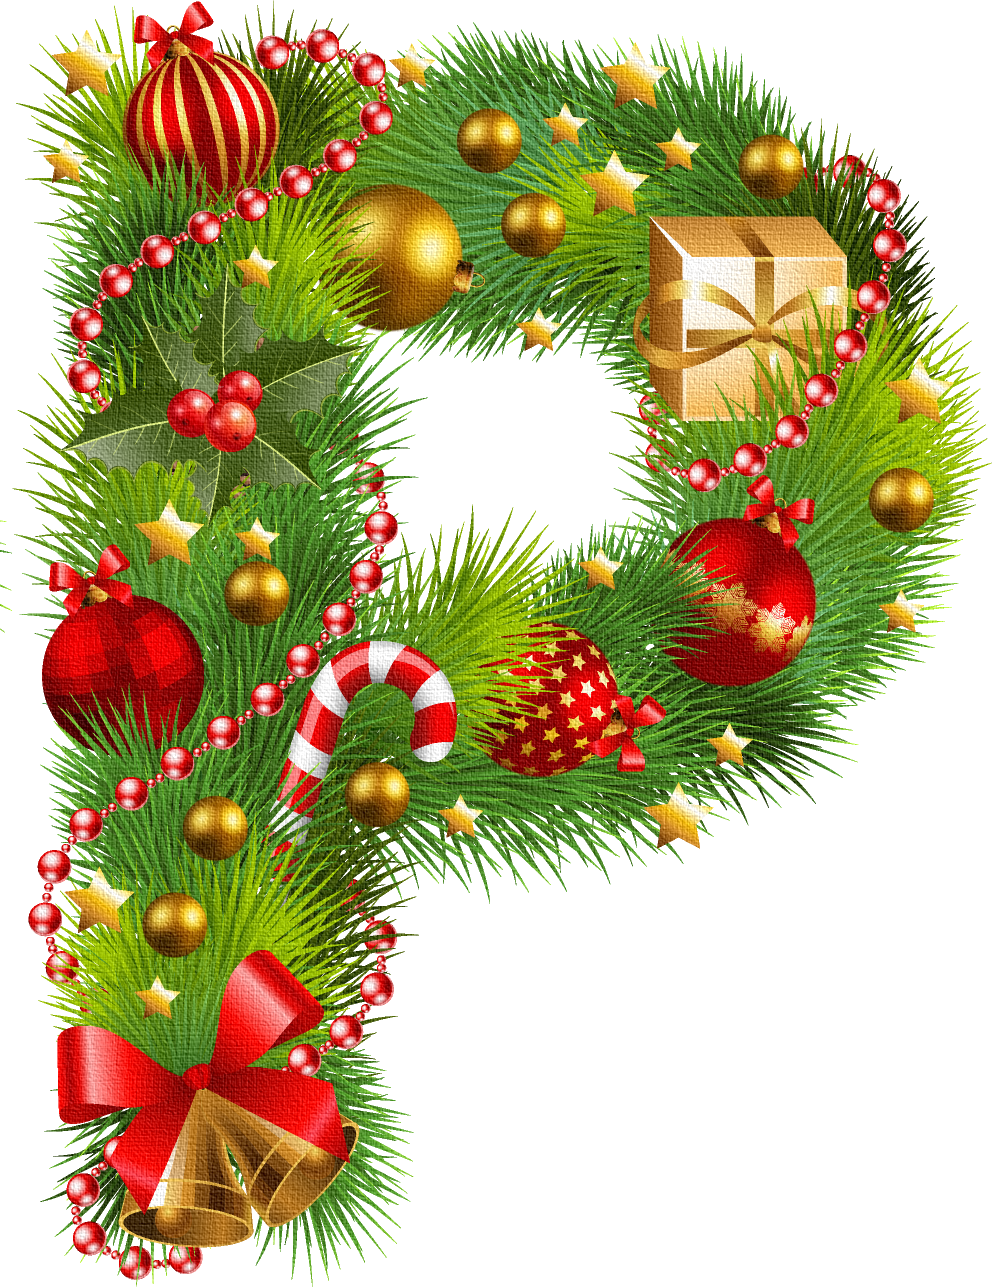 Yeni Il Hərfləri 2017 Christmas Decorations Christmas Bulbs Christmas Wreaths